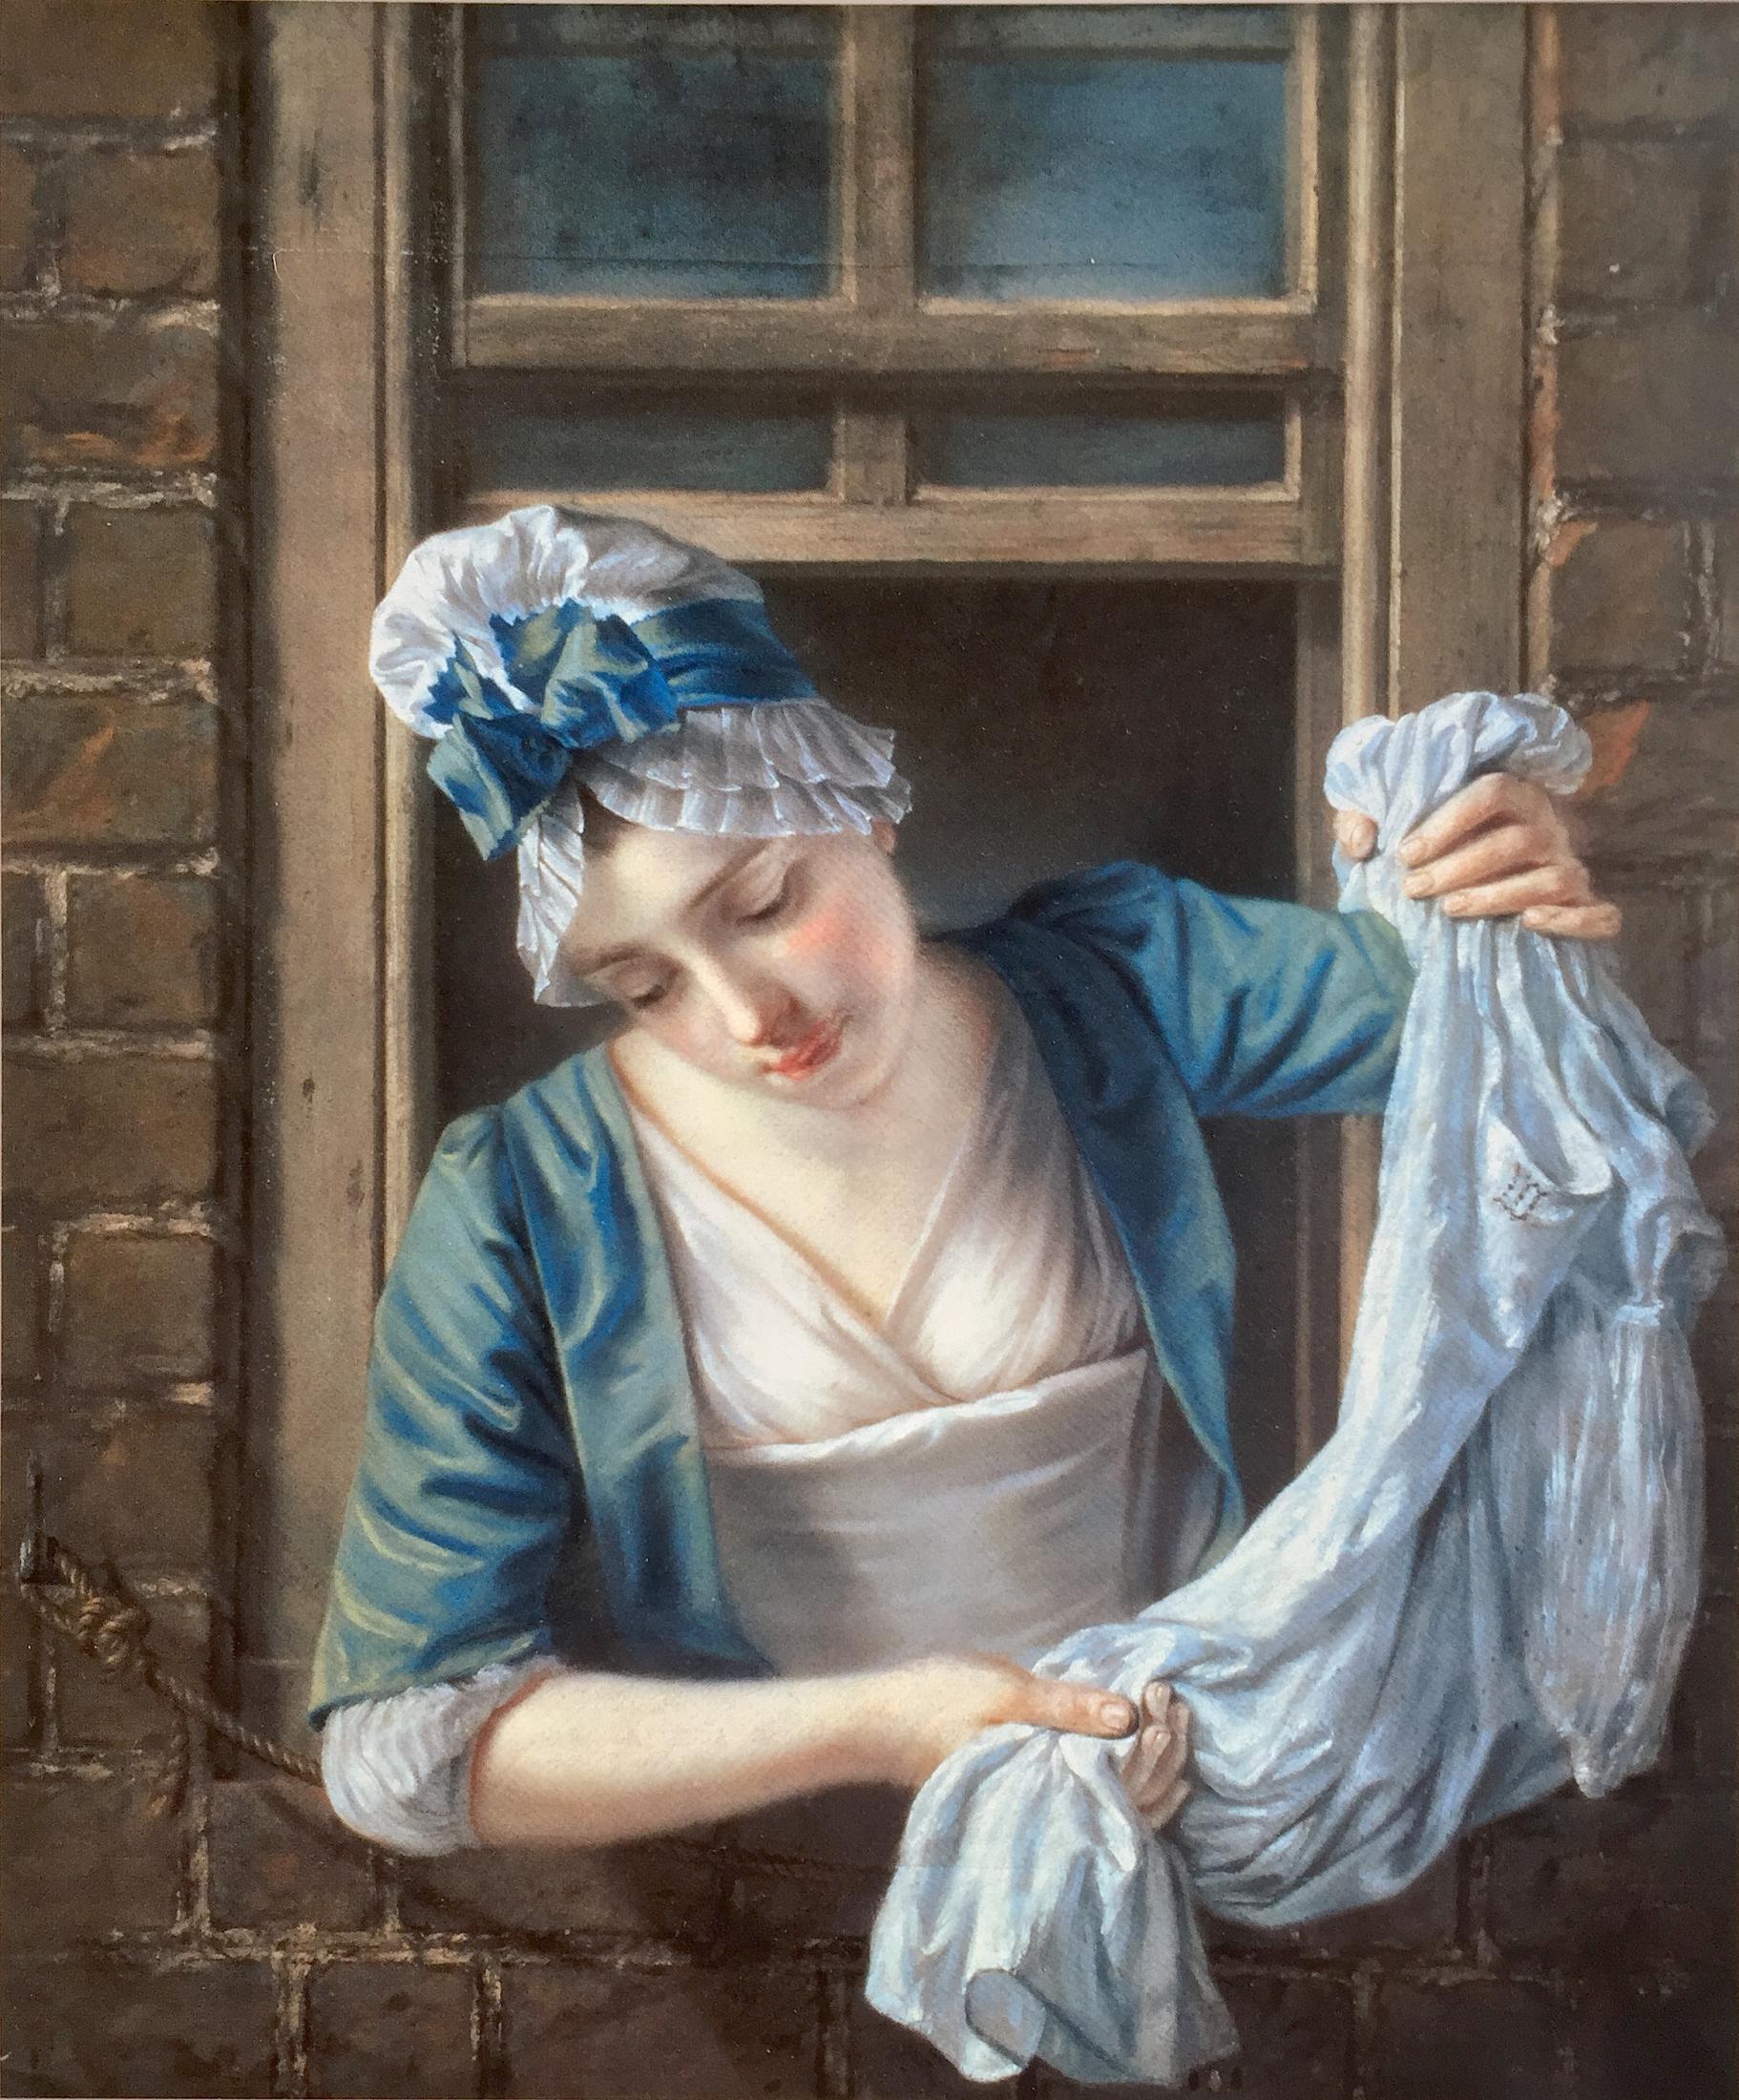 The Laundry Maid